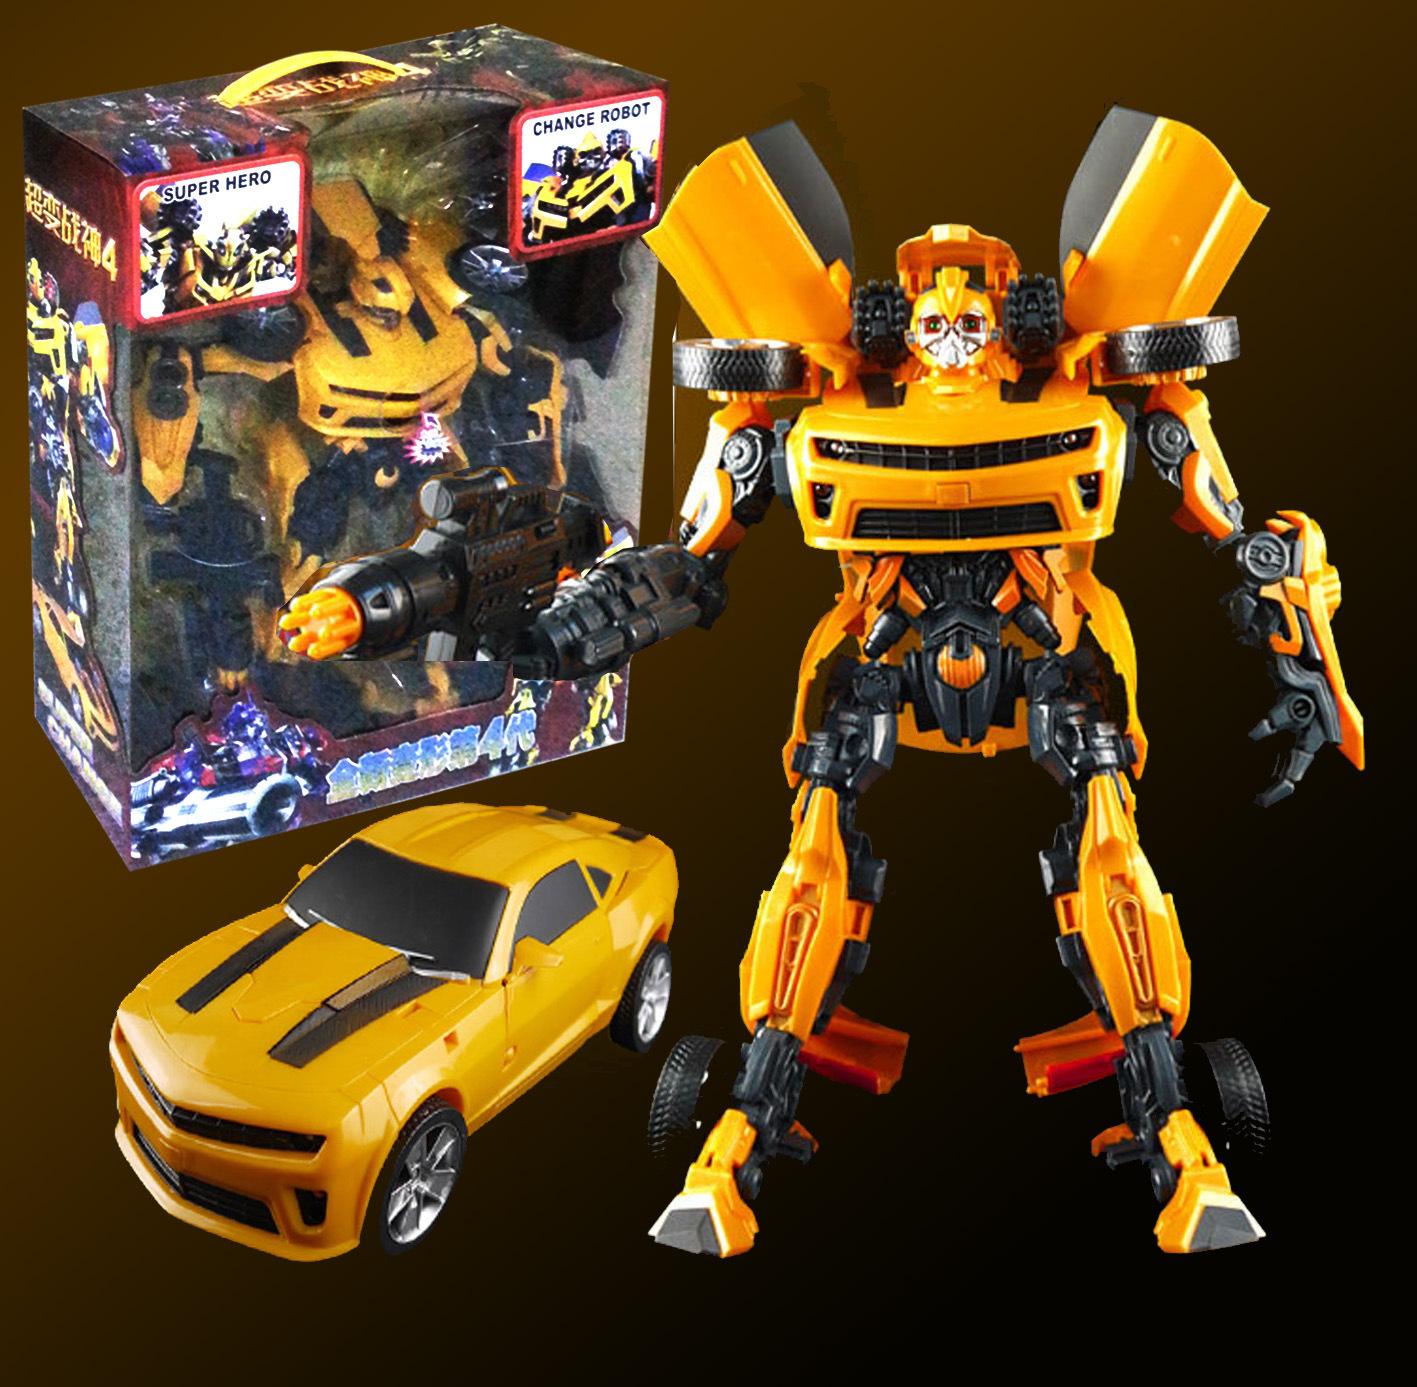 i淘宝阿里爆款 变形金刚大黄蜂 带灯光音乐3C儿童玩具机器人6699